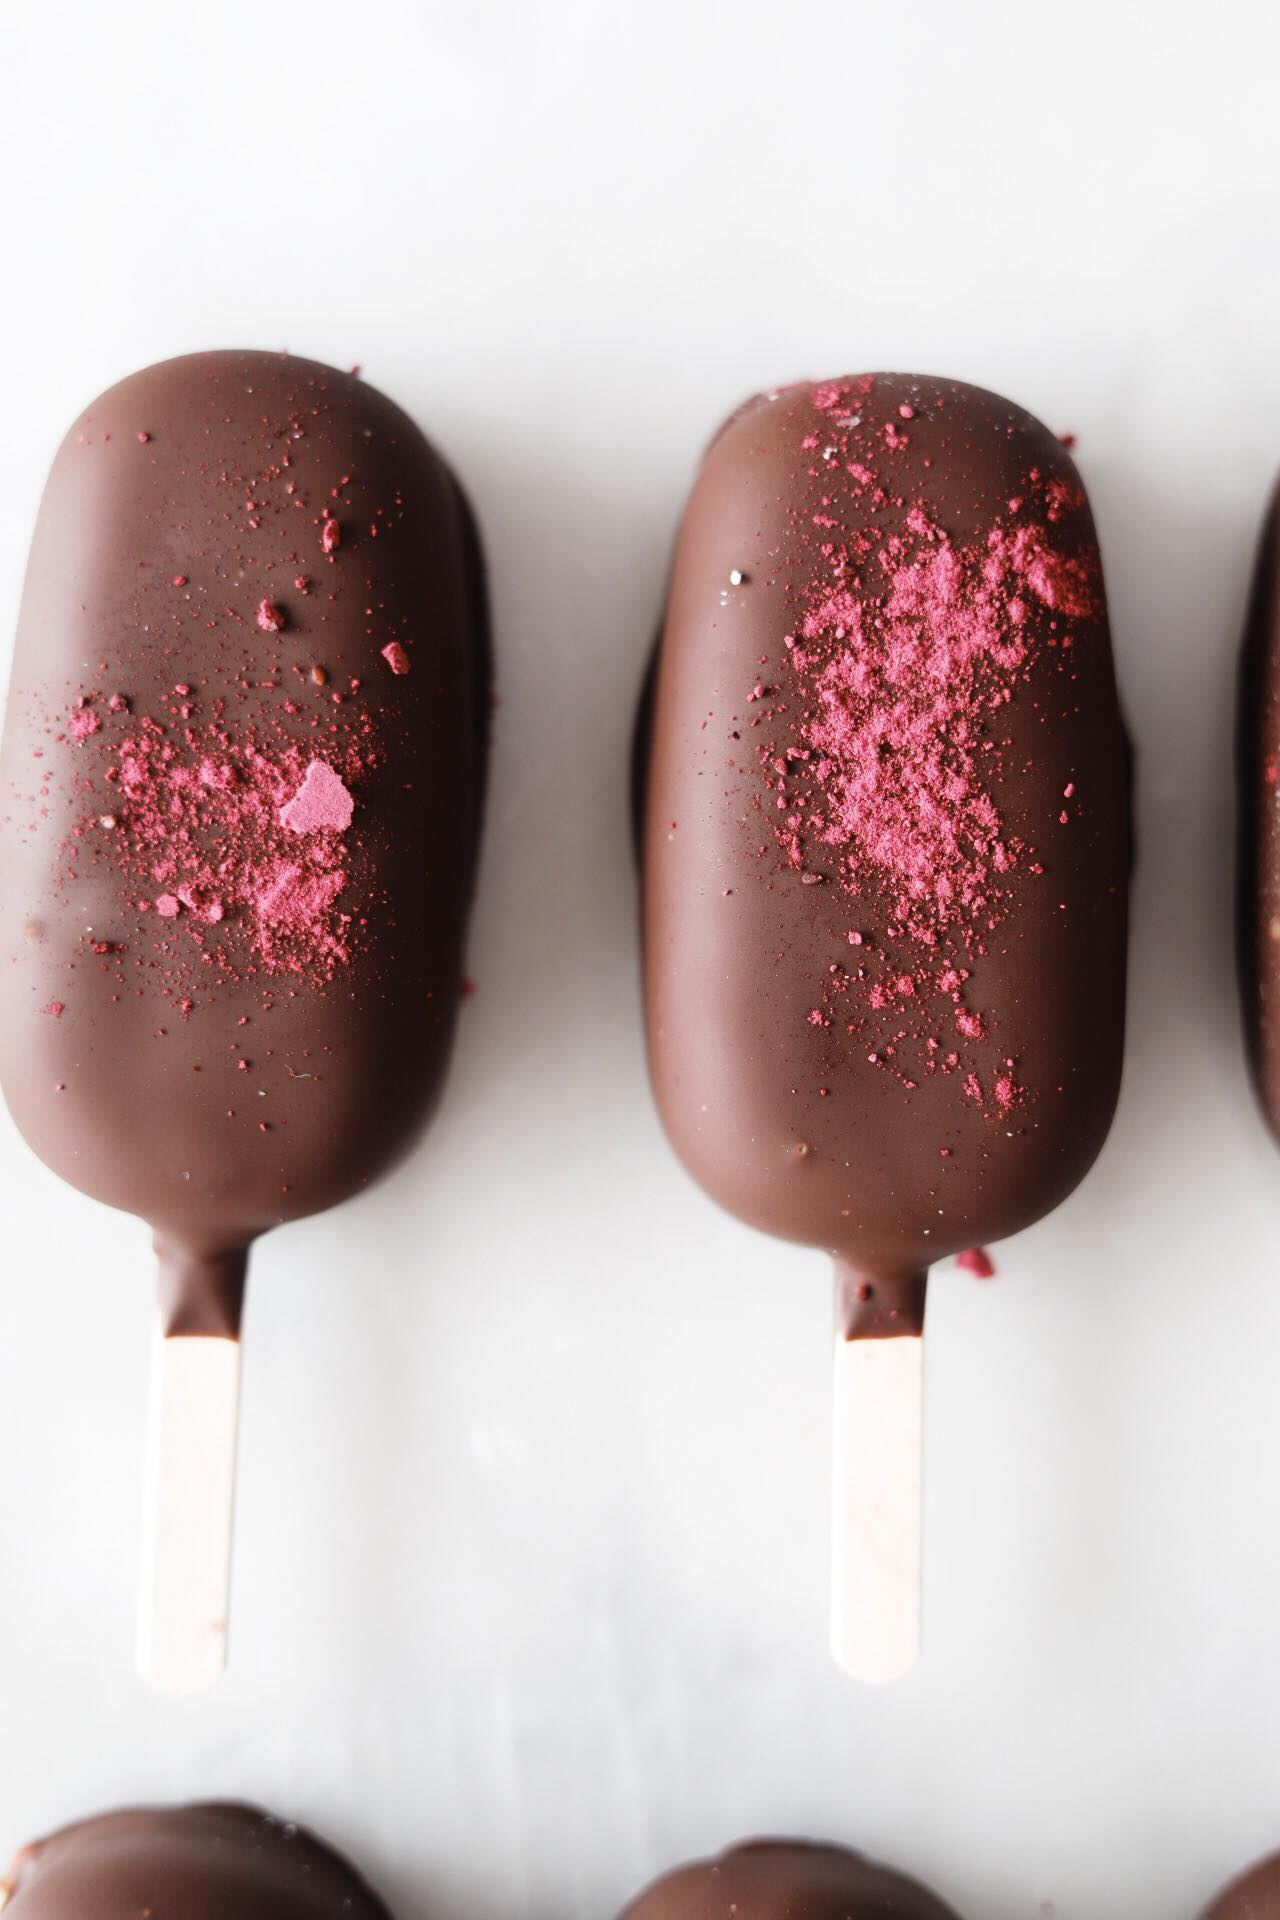 Ispinde med vaniljeis, solbærmarmelade og mørk chokolade